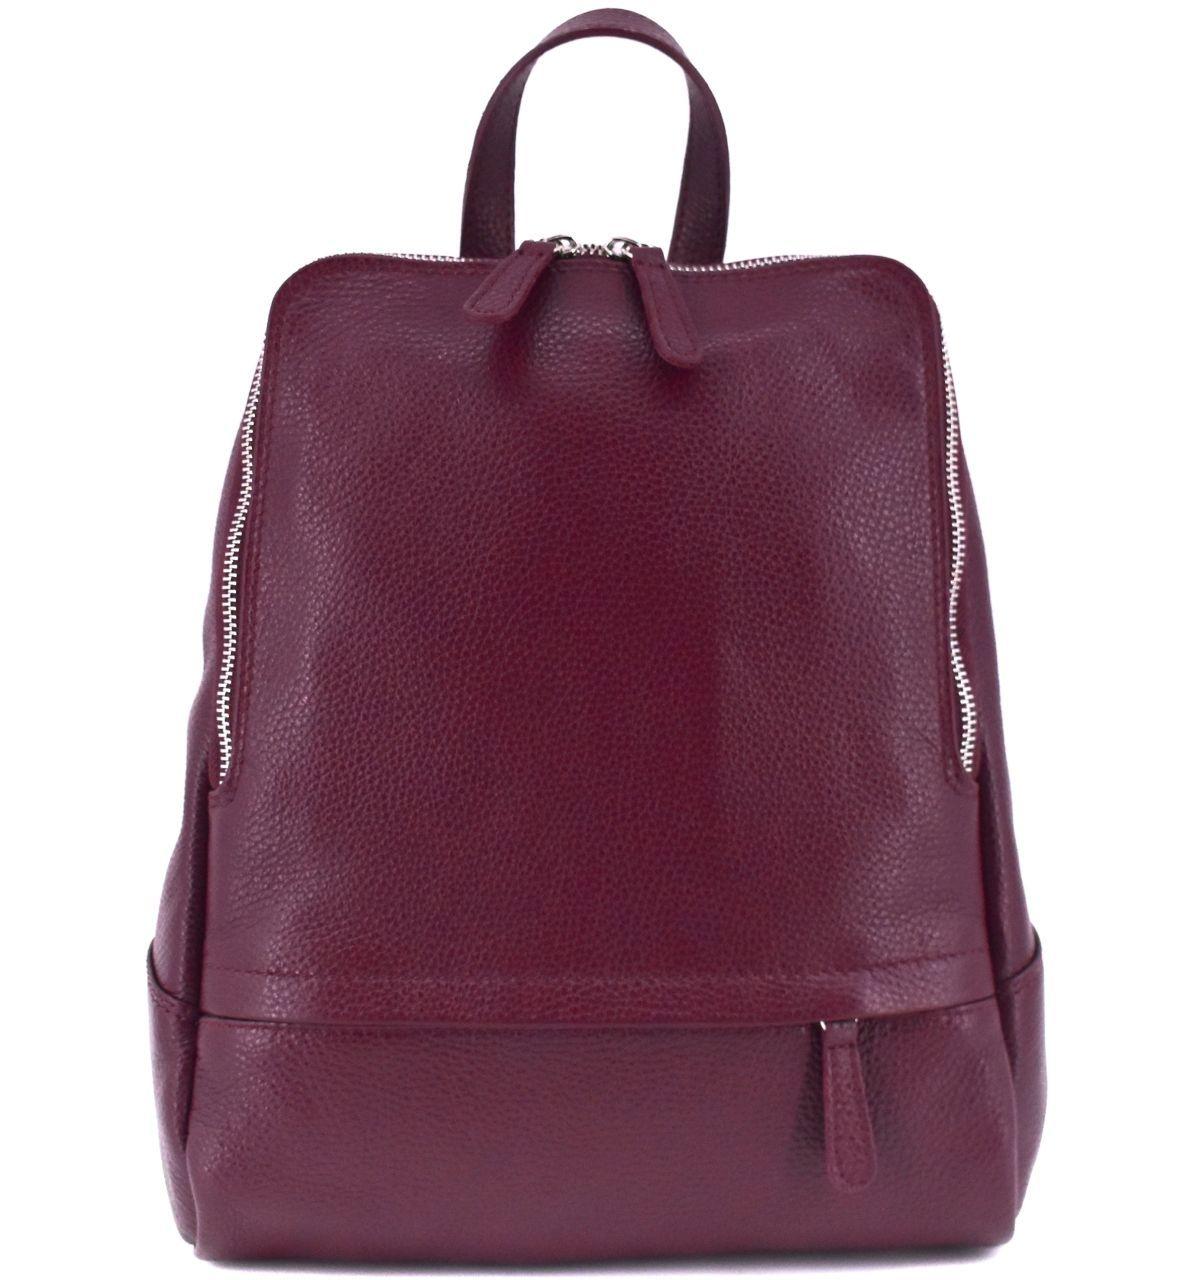 Dámský kožený batoh Arteddy - vínová 36931